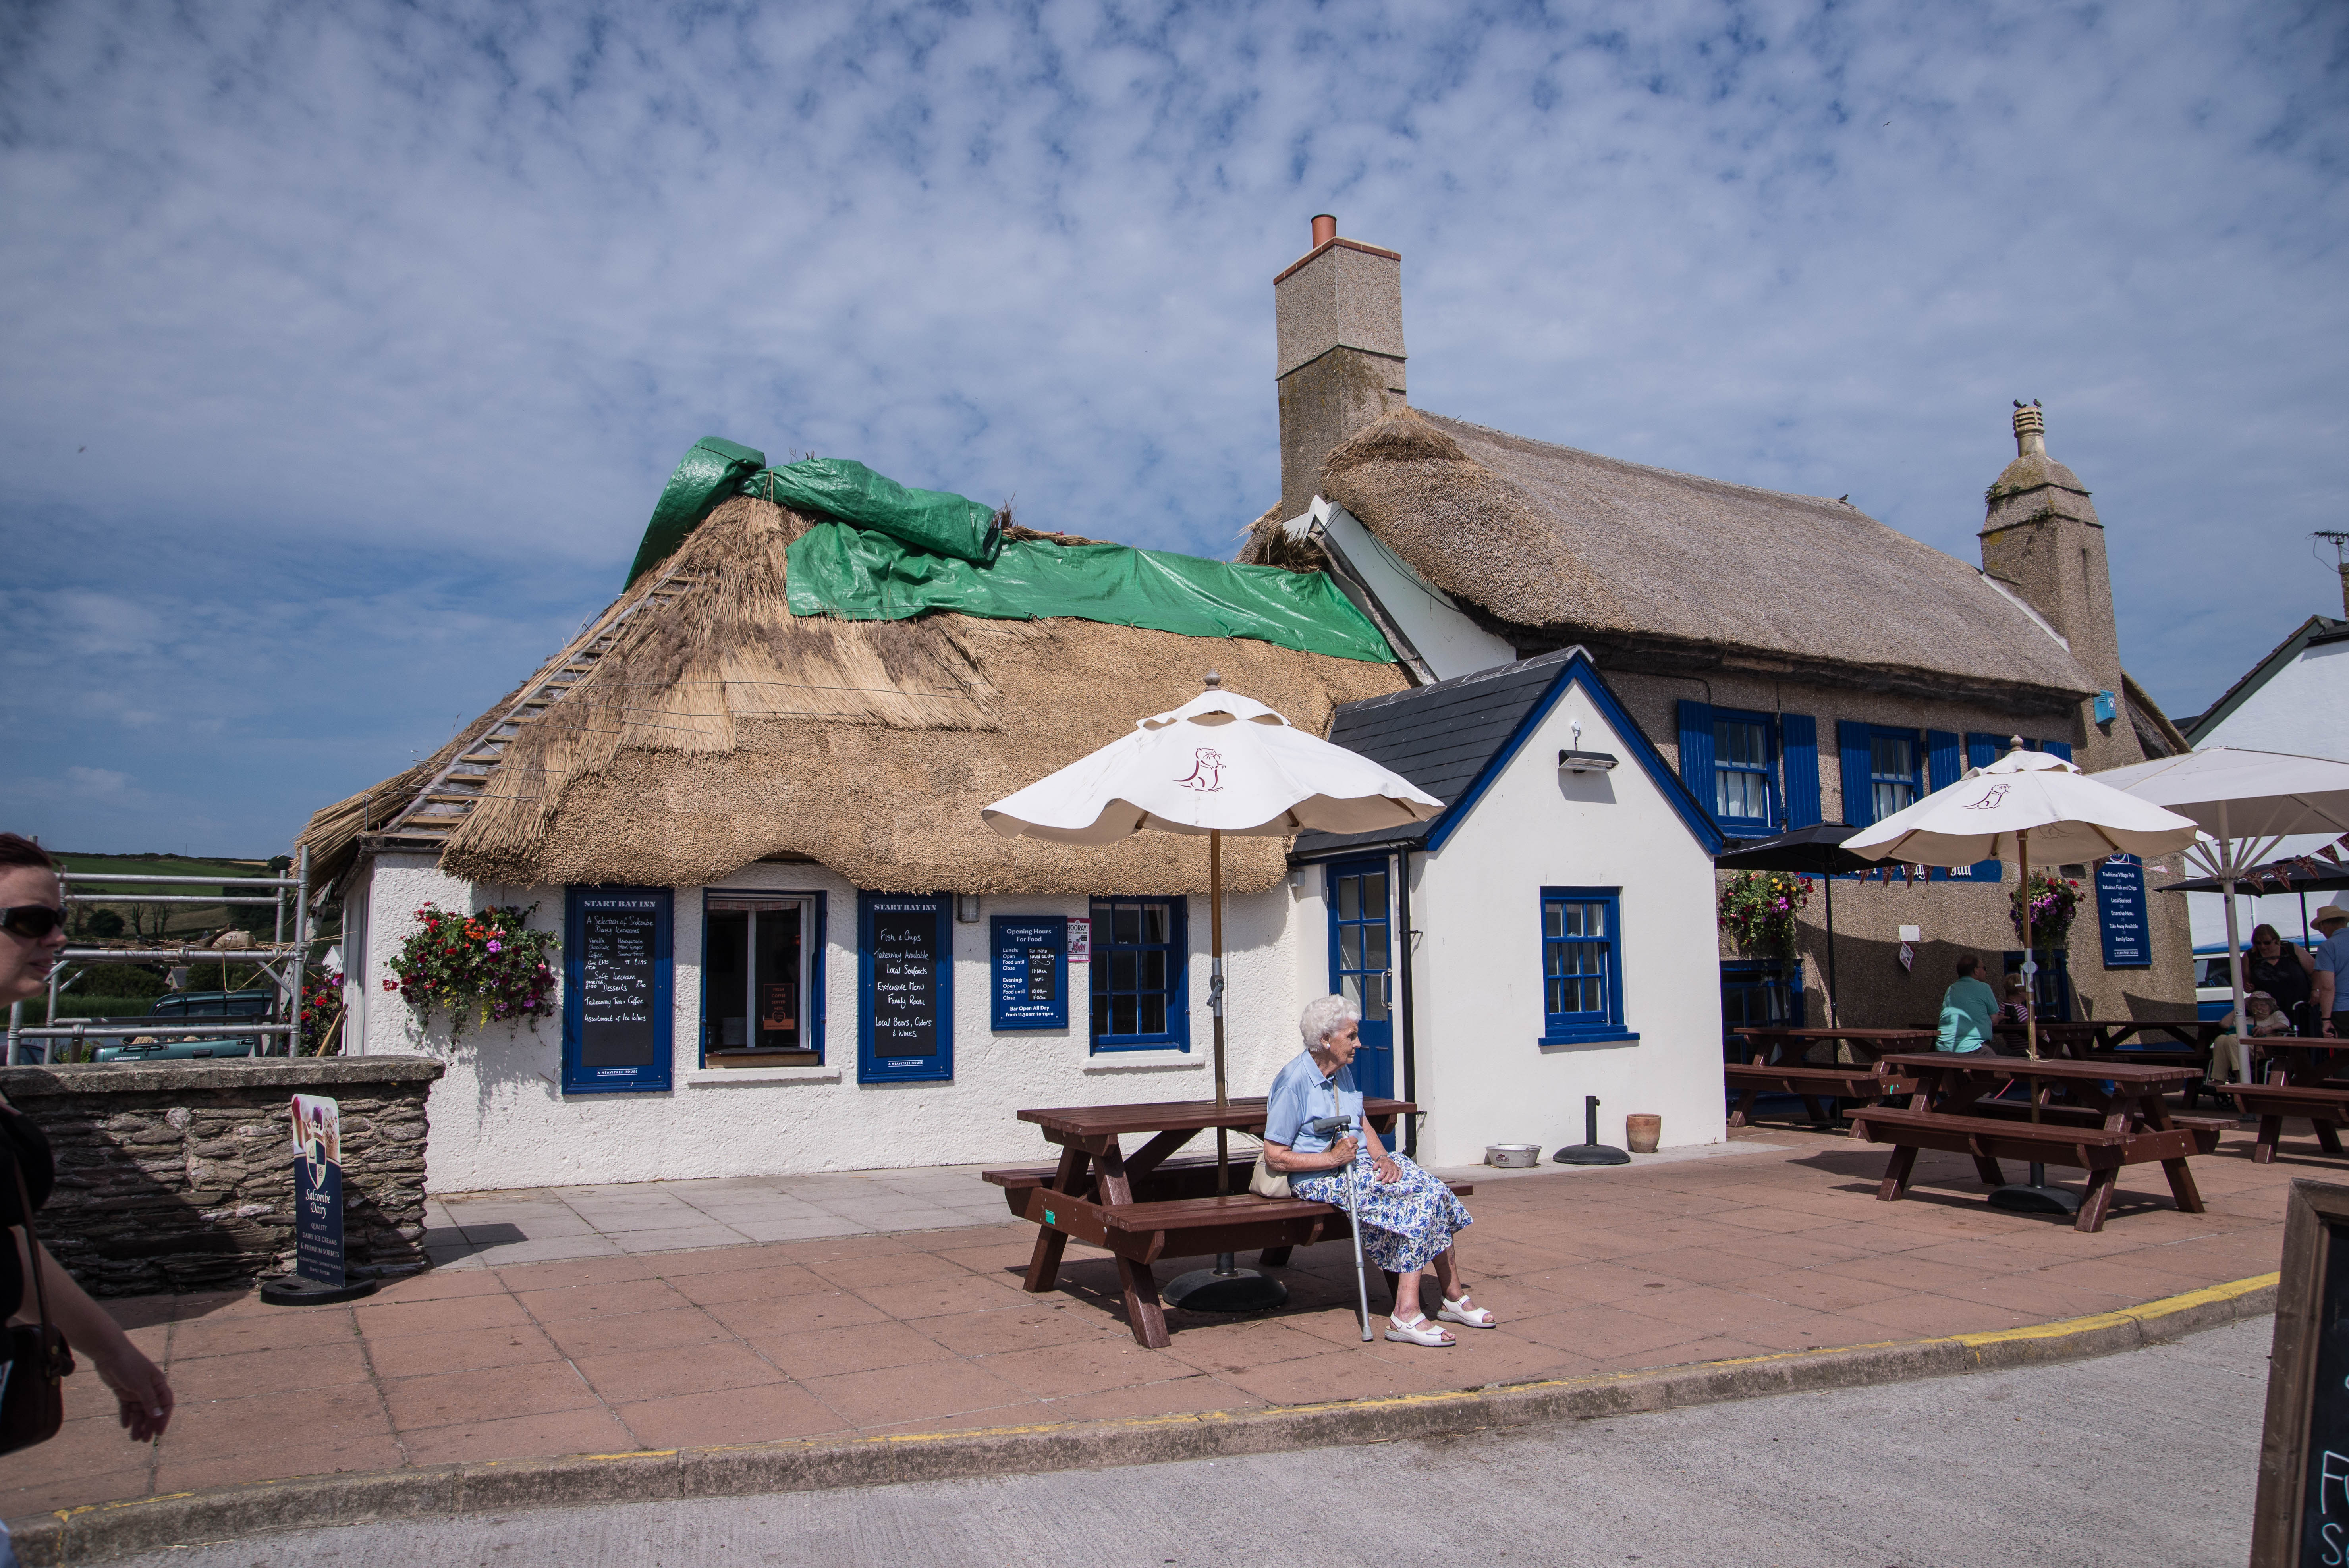 Start Bay Inn, South Hams, Devon